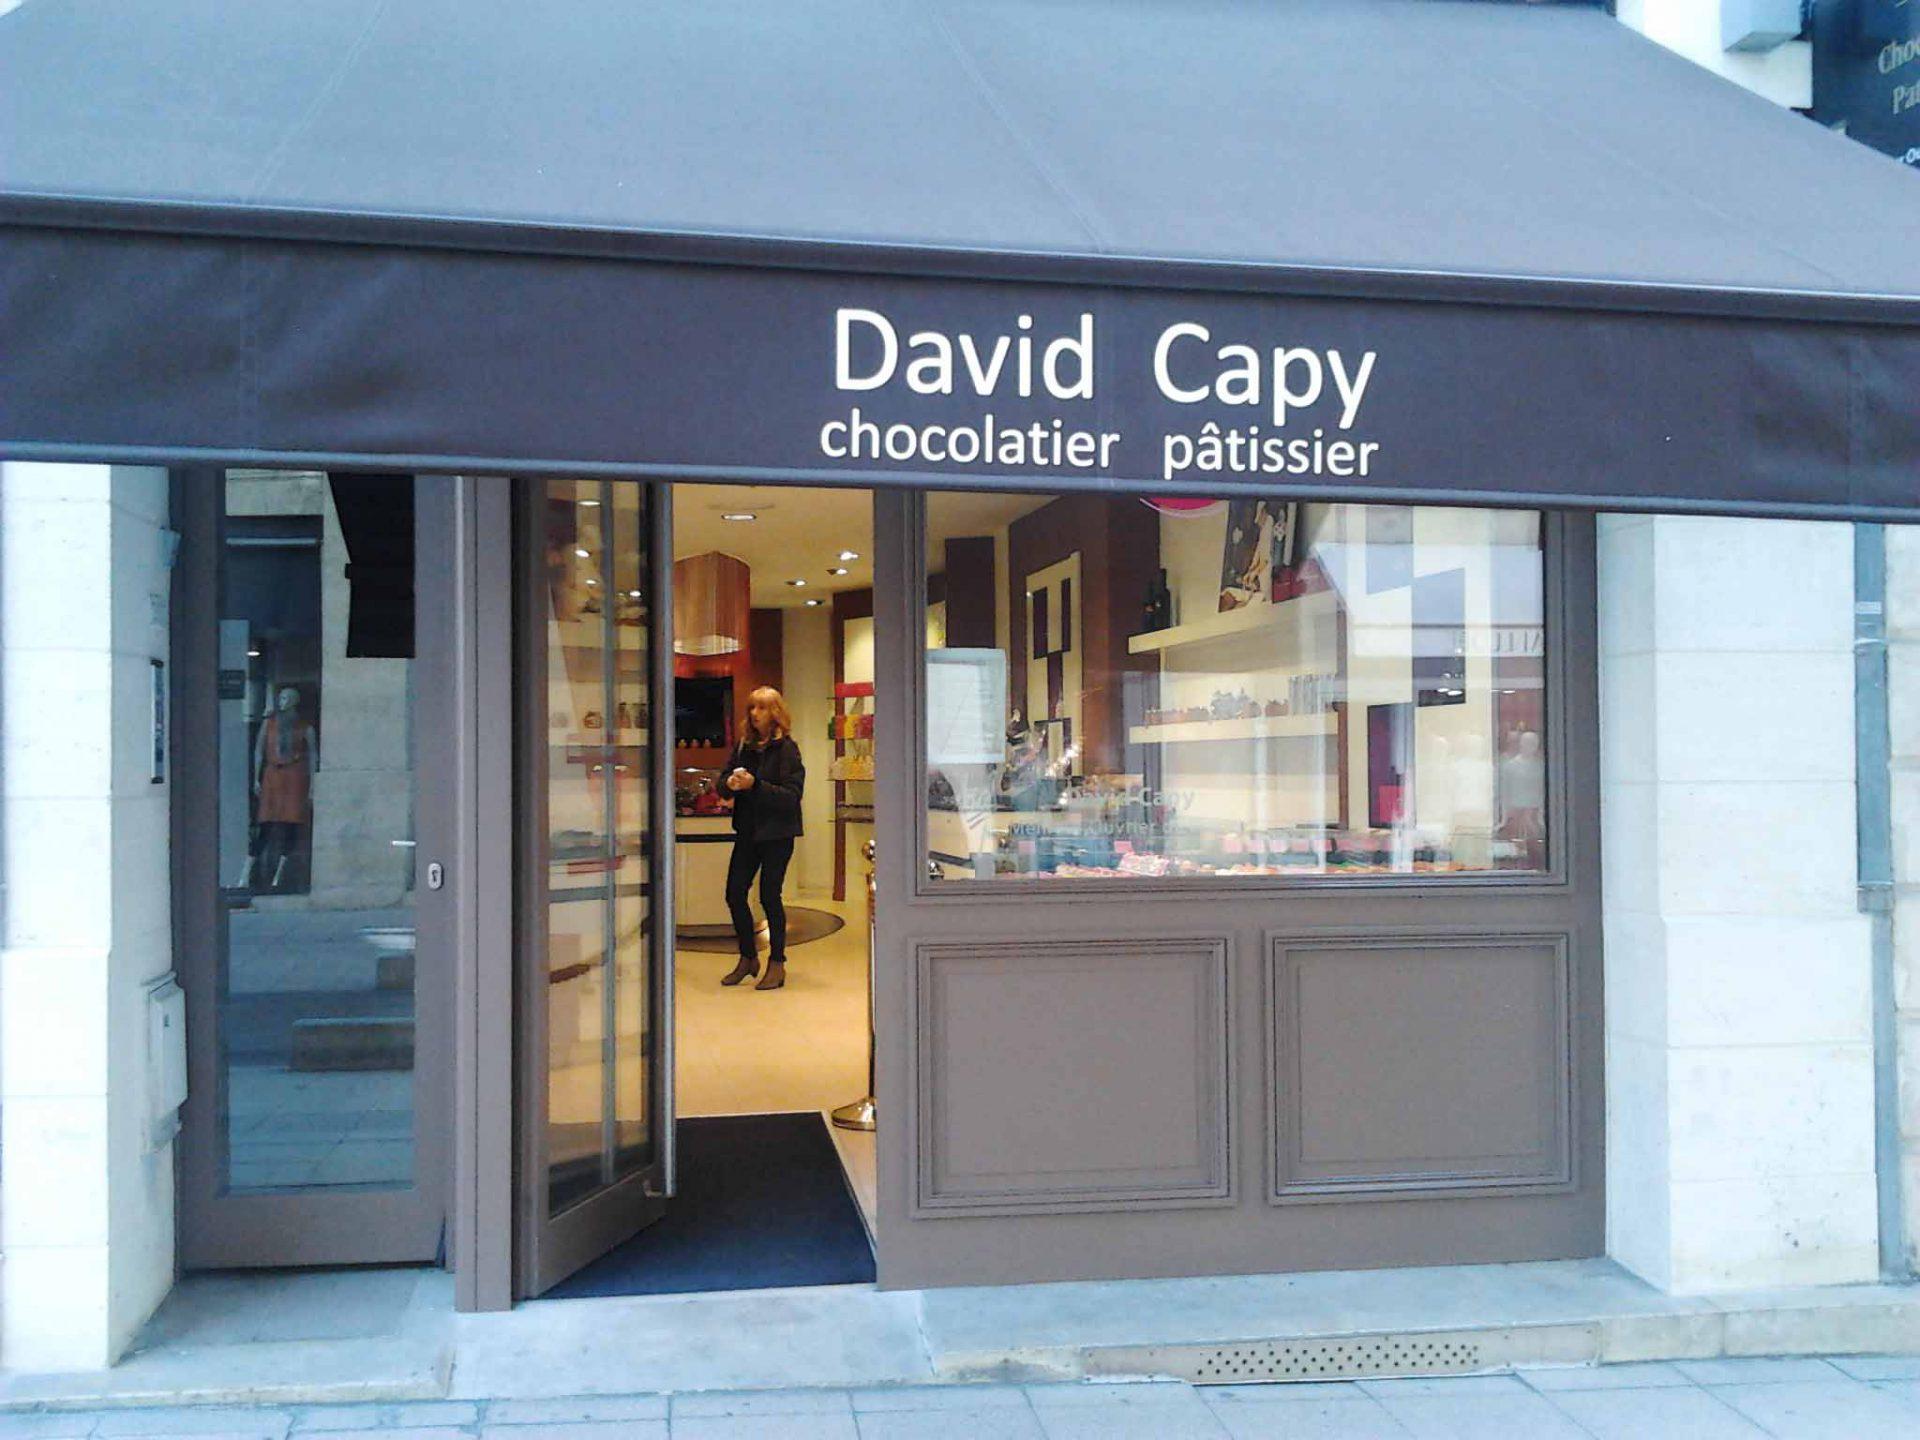 David Capy